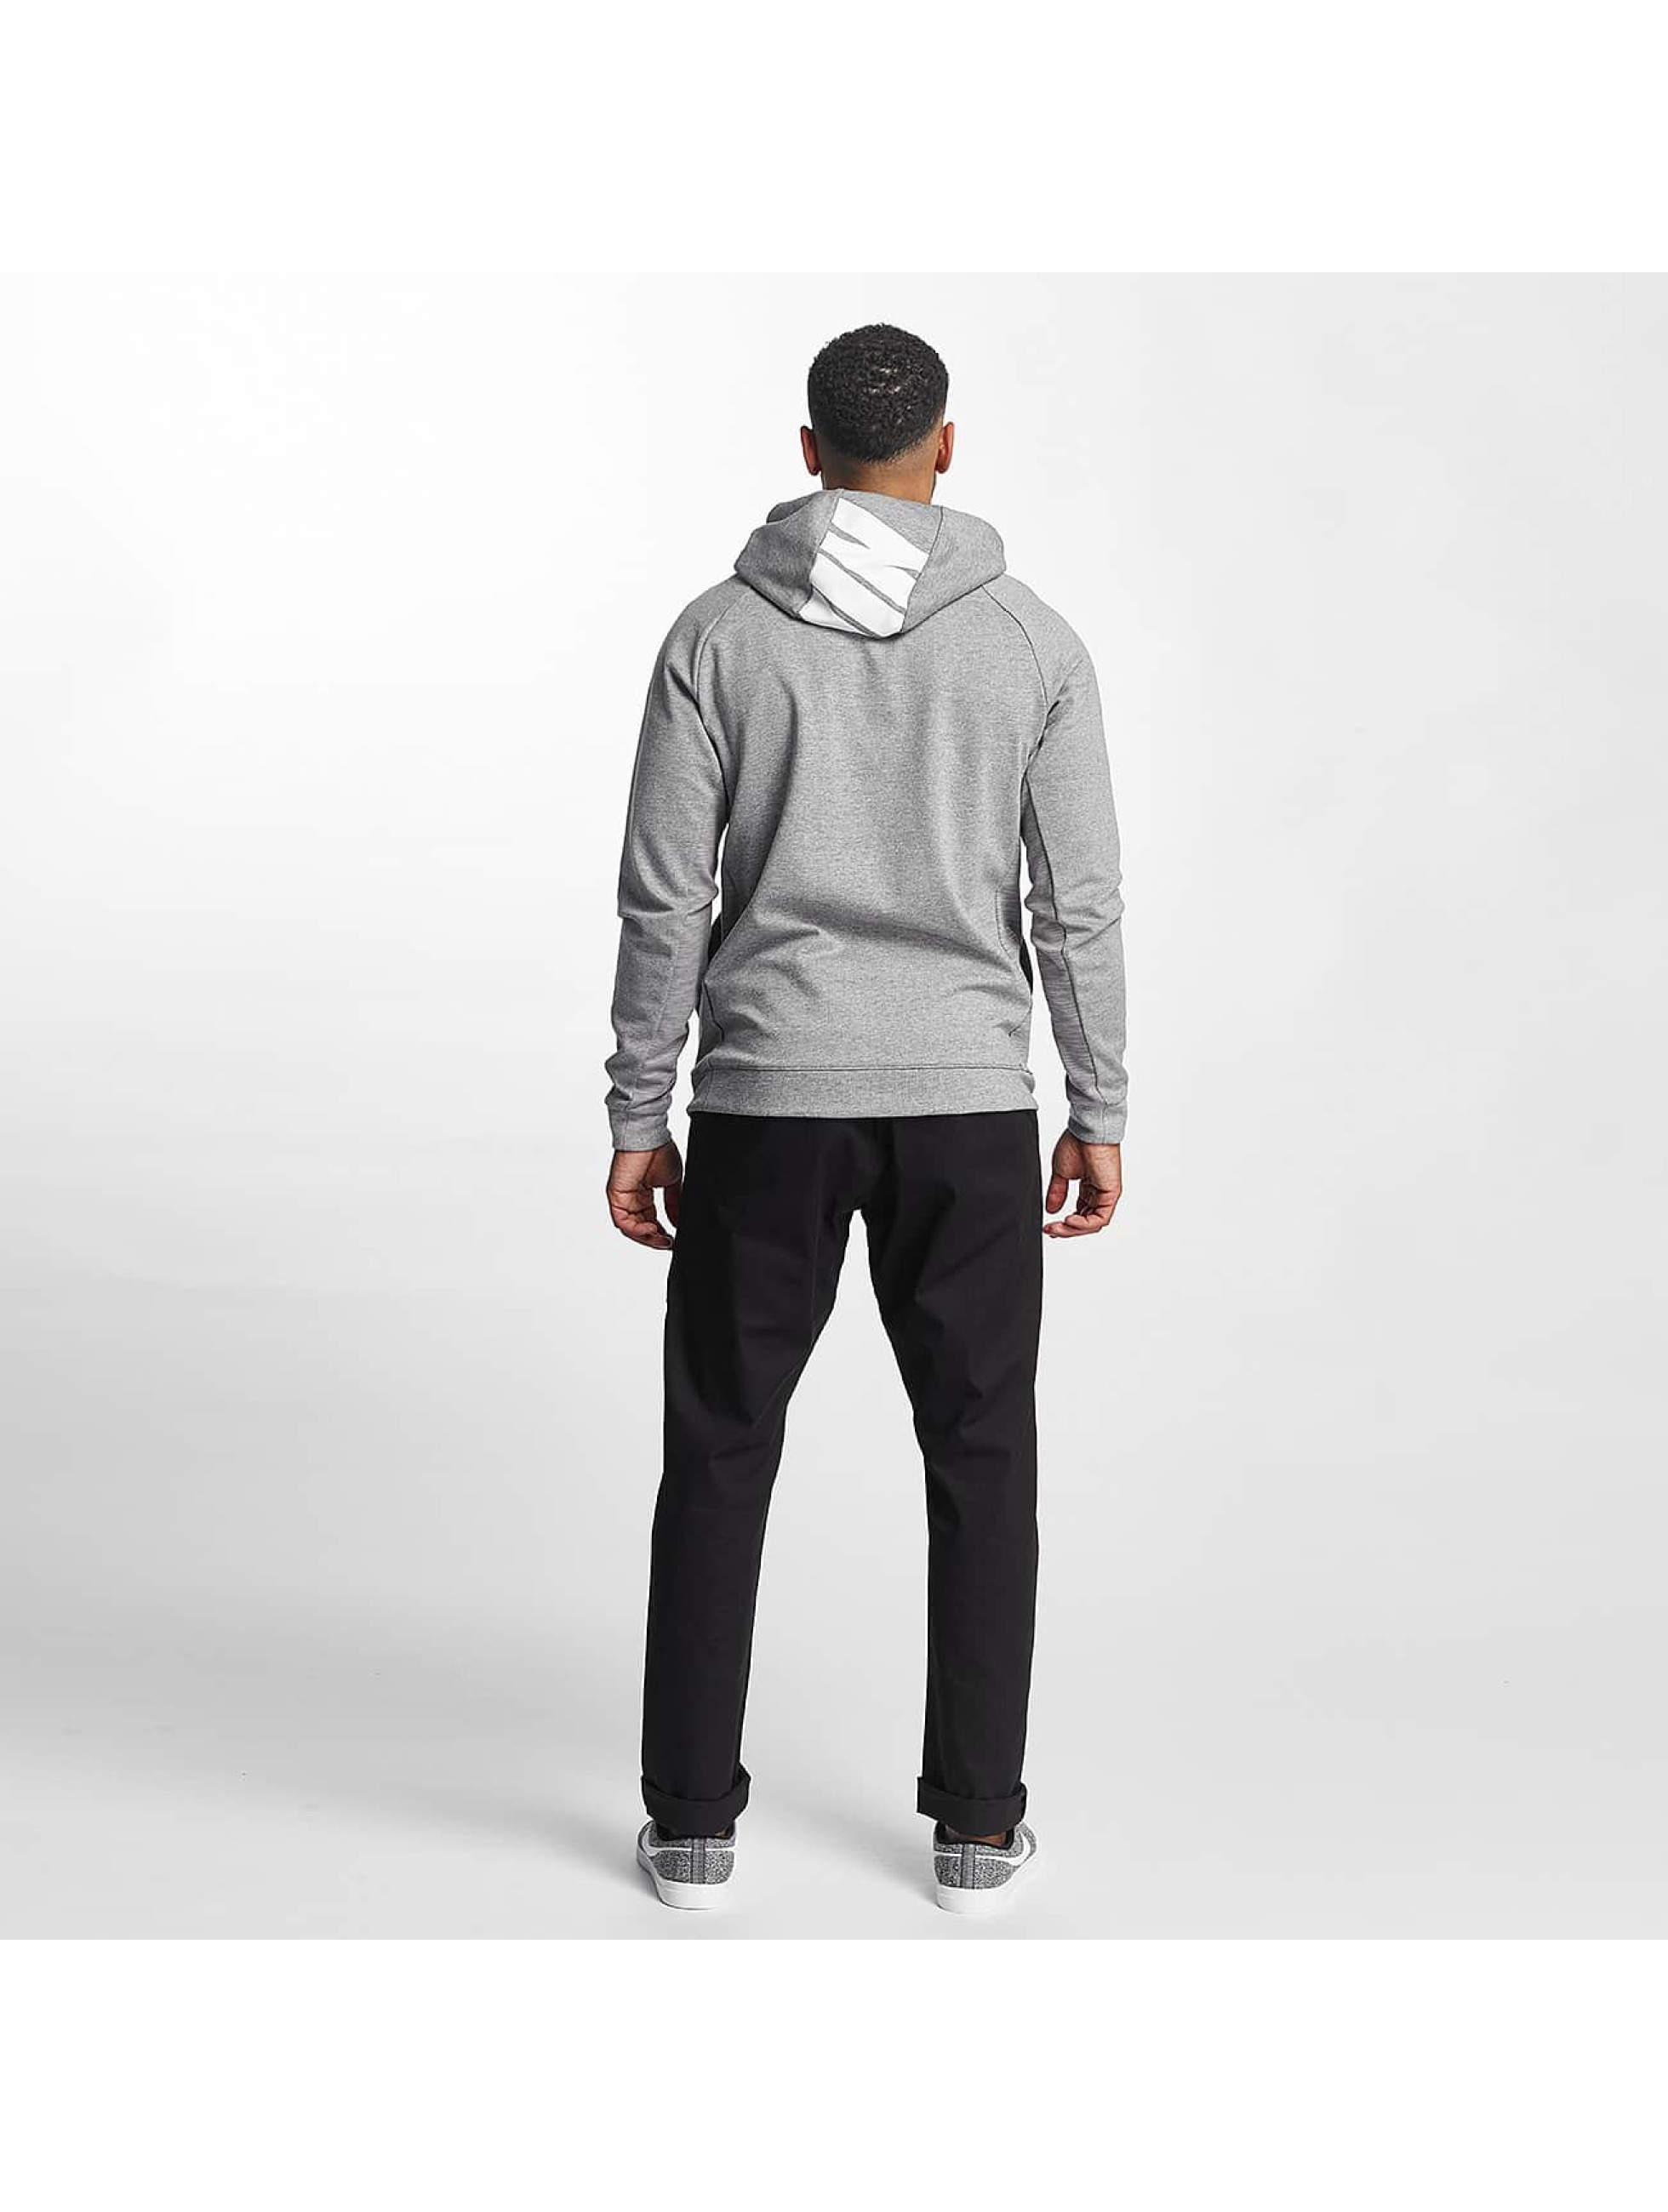 nike sb sb icon noir homme pantalon chino 332133. Black Bedroom Furniture Sets. Home Design Ideas